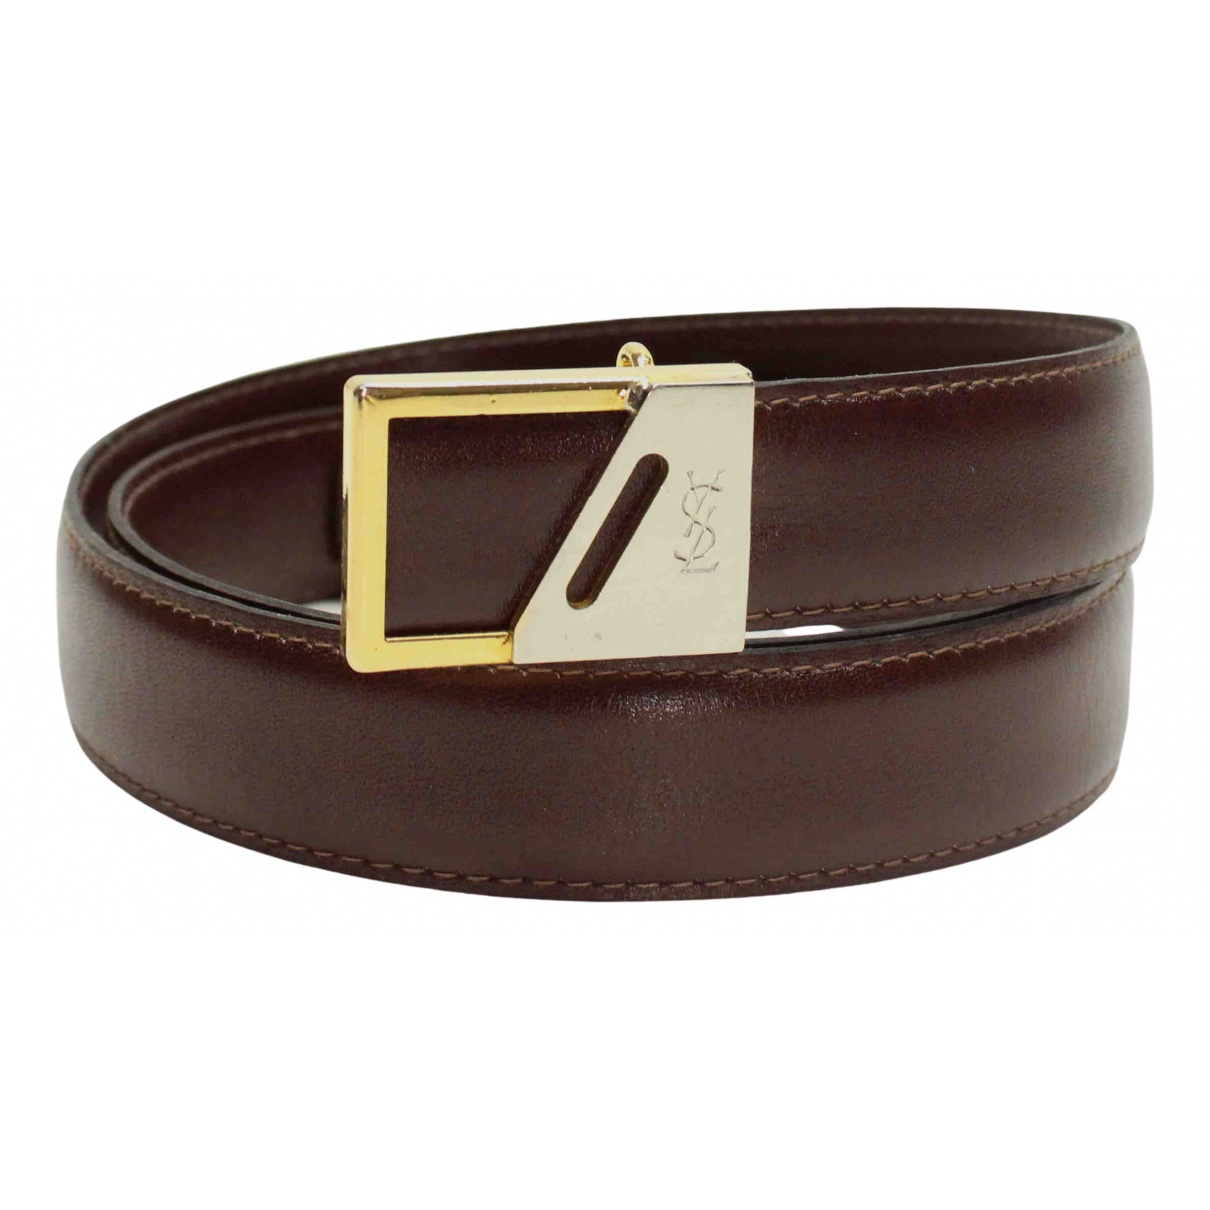 Yves Saint Laurent N Brown Leather belt for Men 95 cm